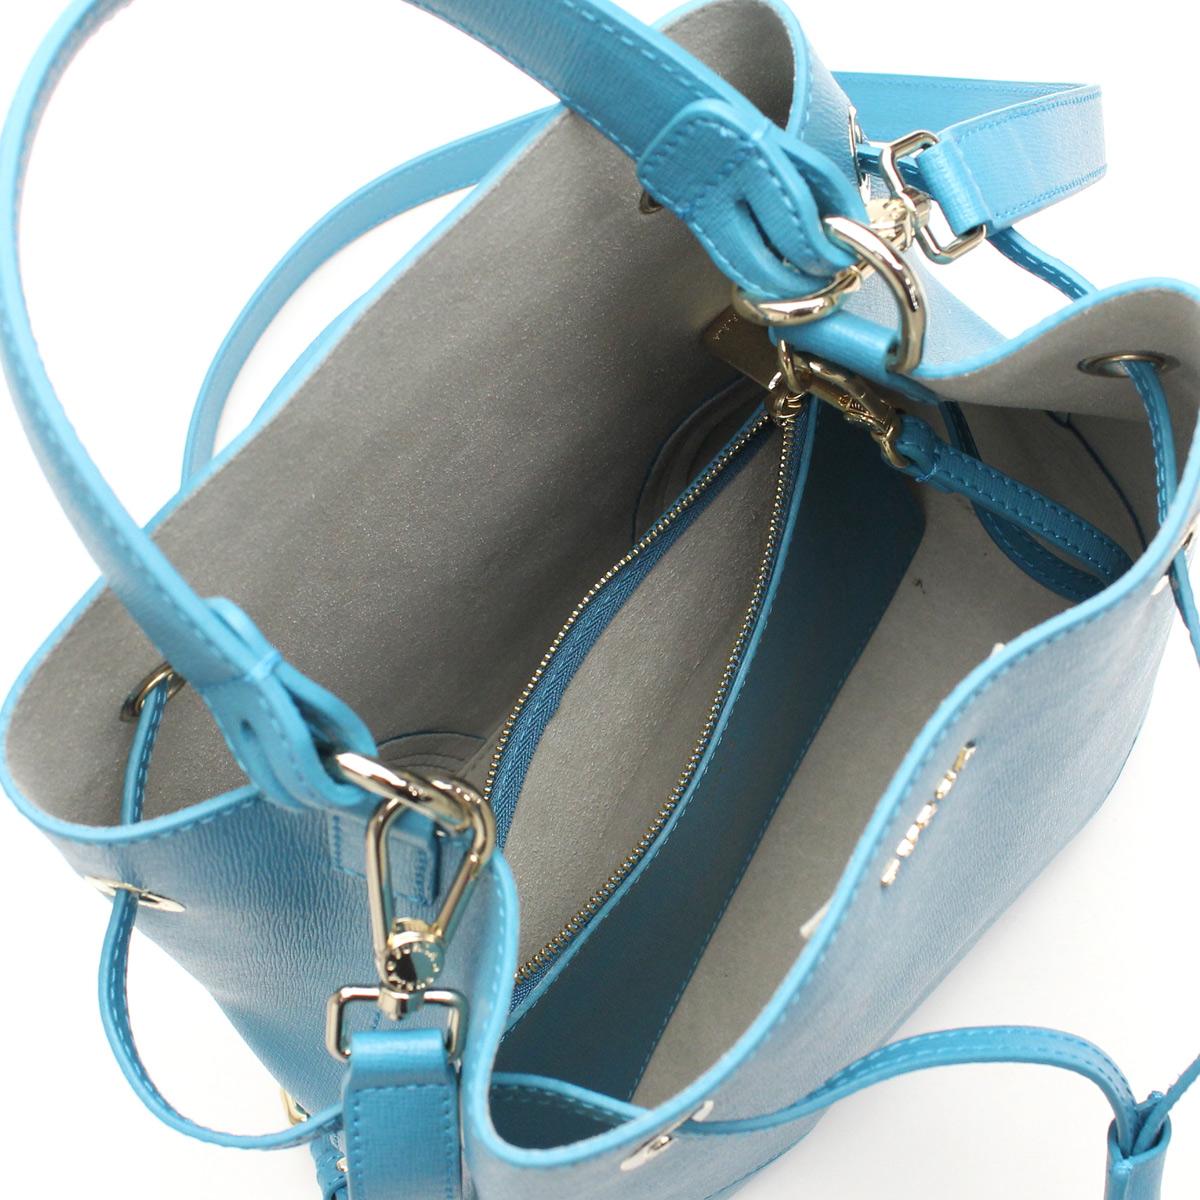 FURLA (FURLA) STACY handbag BEH3 820891-B30-TR4 TURCHESE blue( taxfree/send by EMS/authentic/A brand new item )